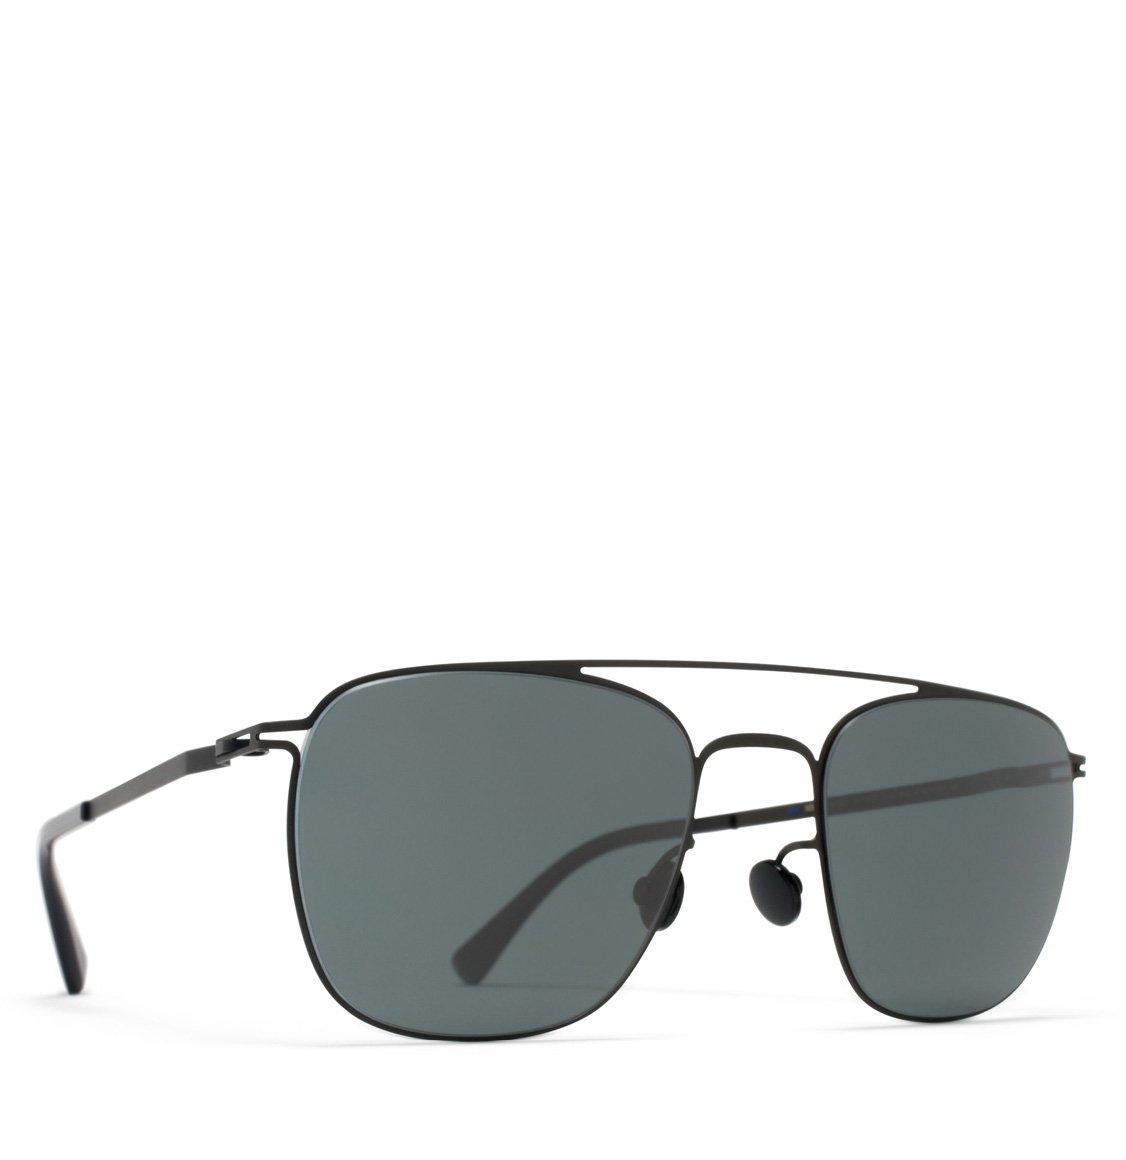 Mykita Aviator-Frame Black Solid Sunglasses